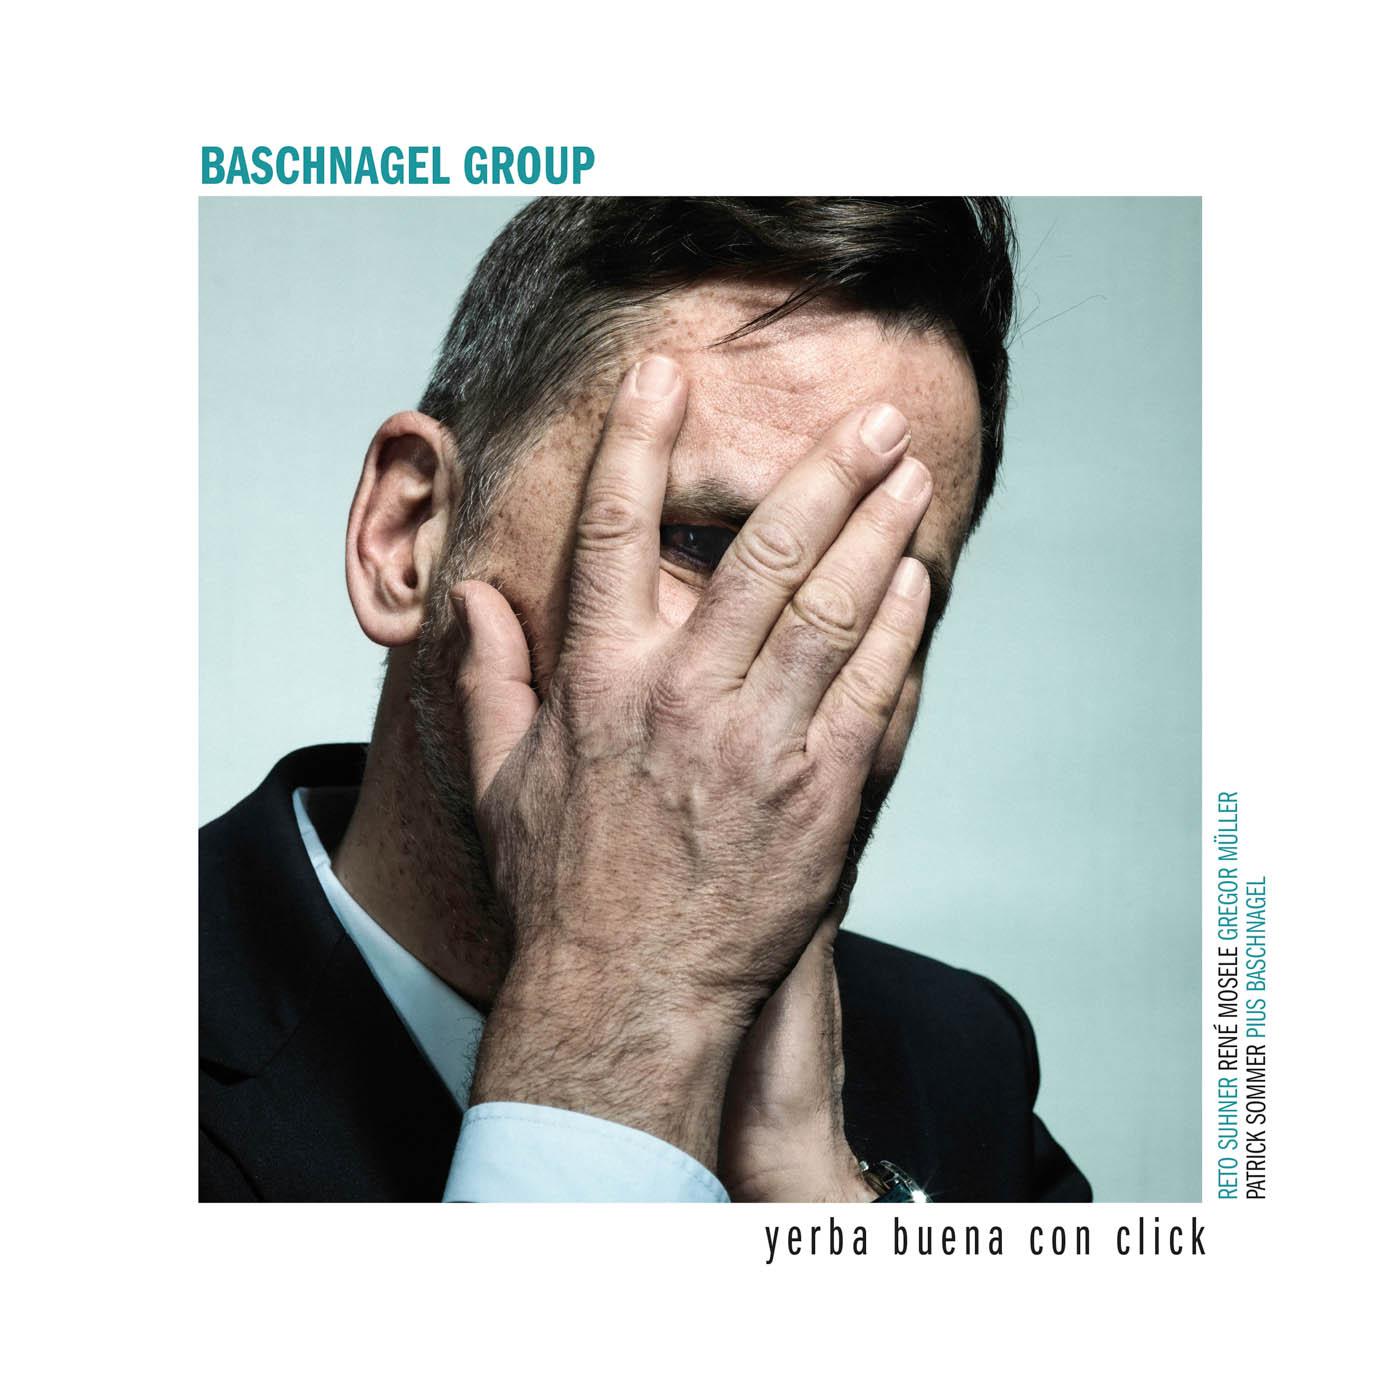 Baschnagel Group – Single